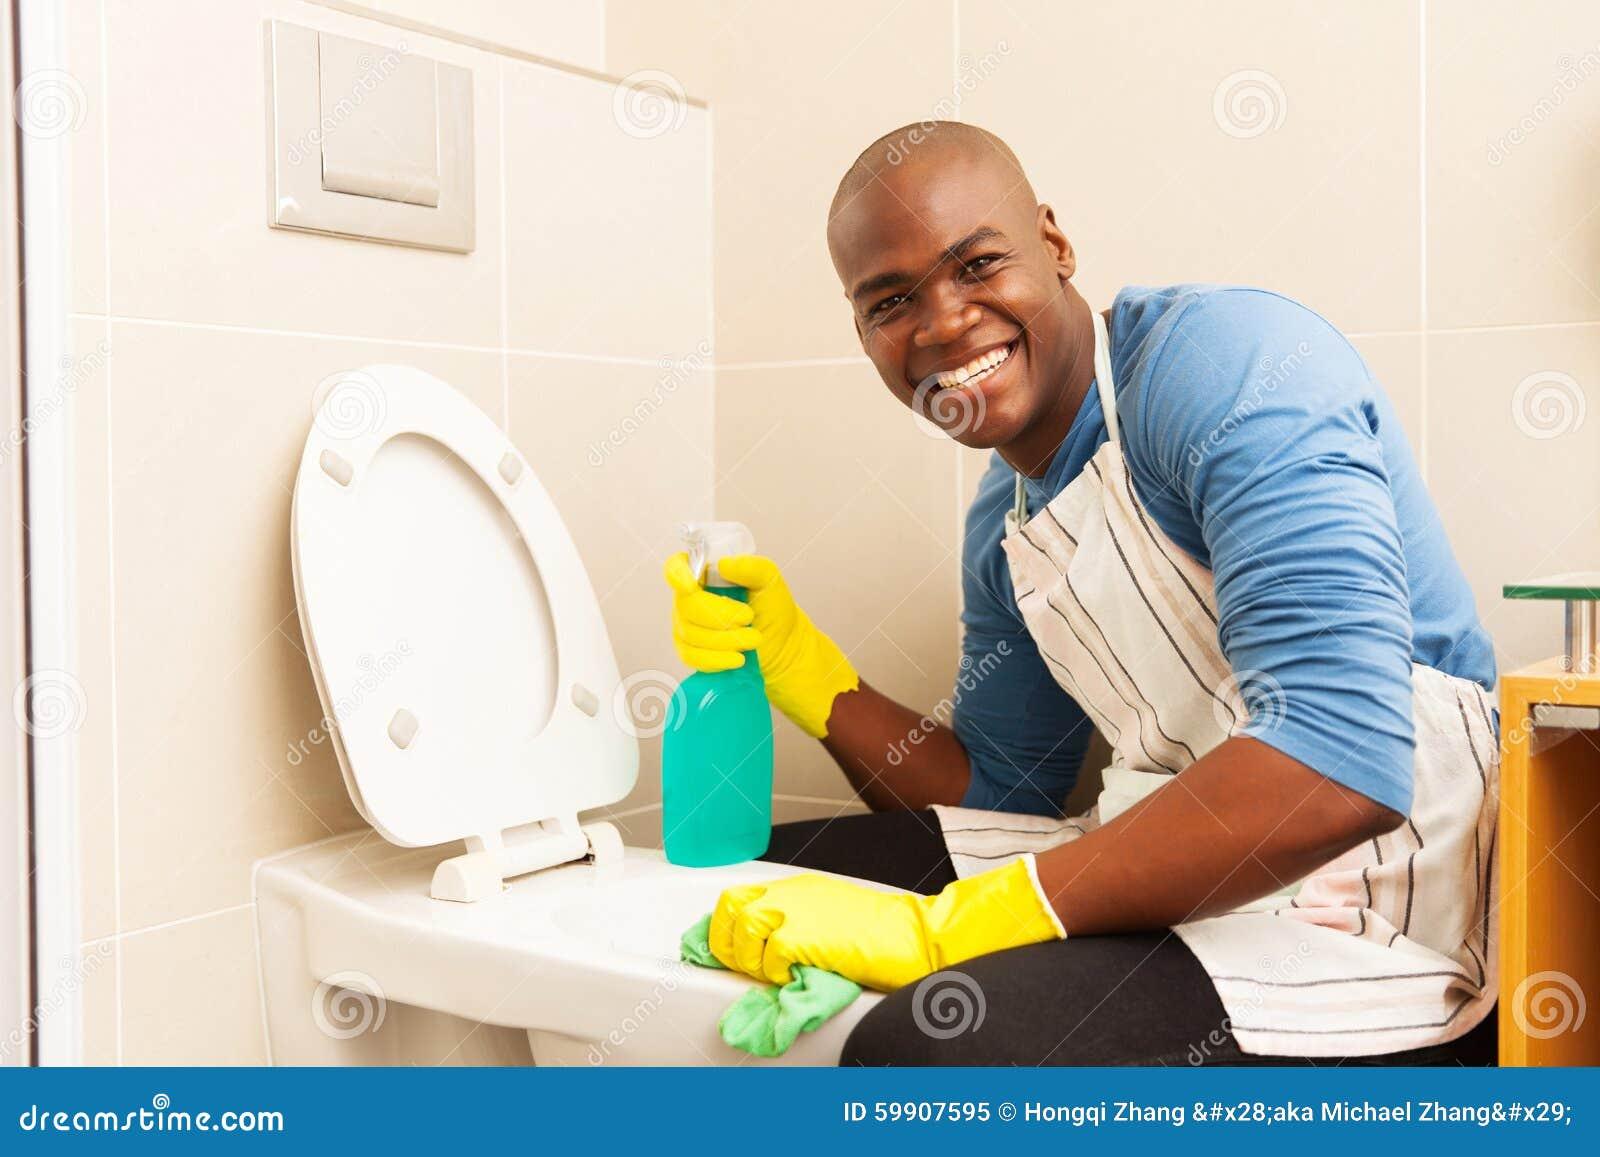 toilette de nettoyage d 39 homme image stock image 59907595. Black Bedroom Furniture Sets. Home Design Ideas